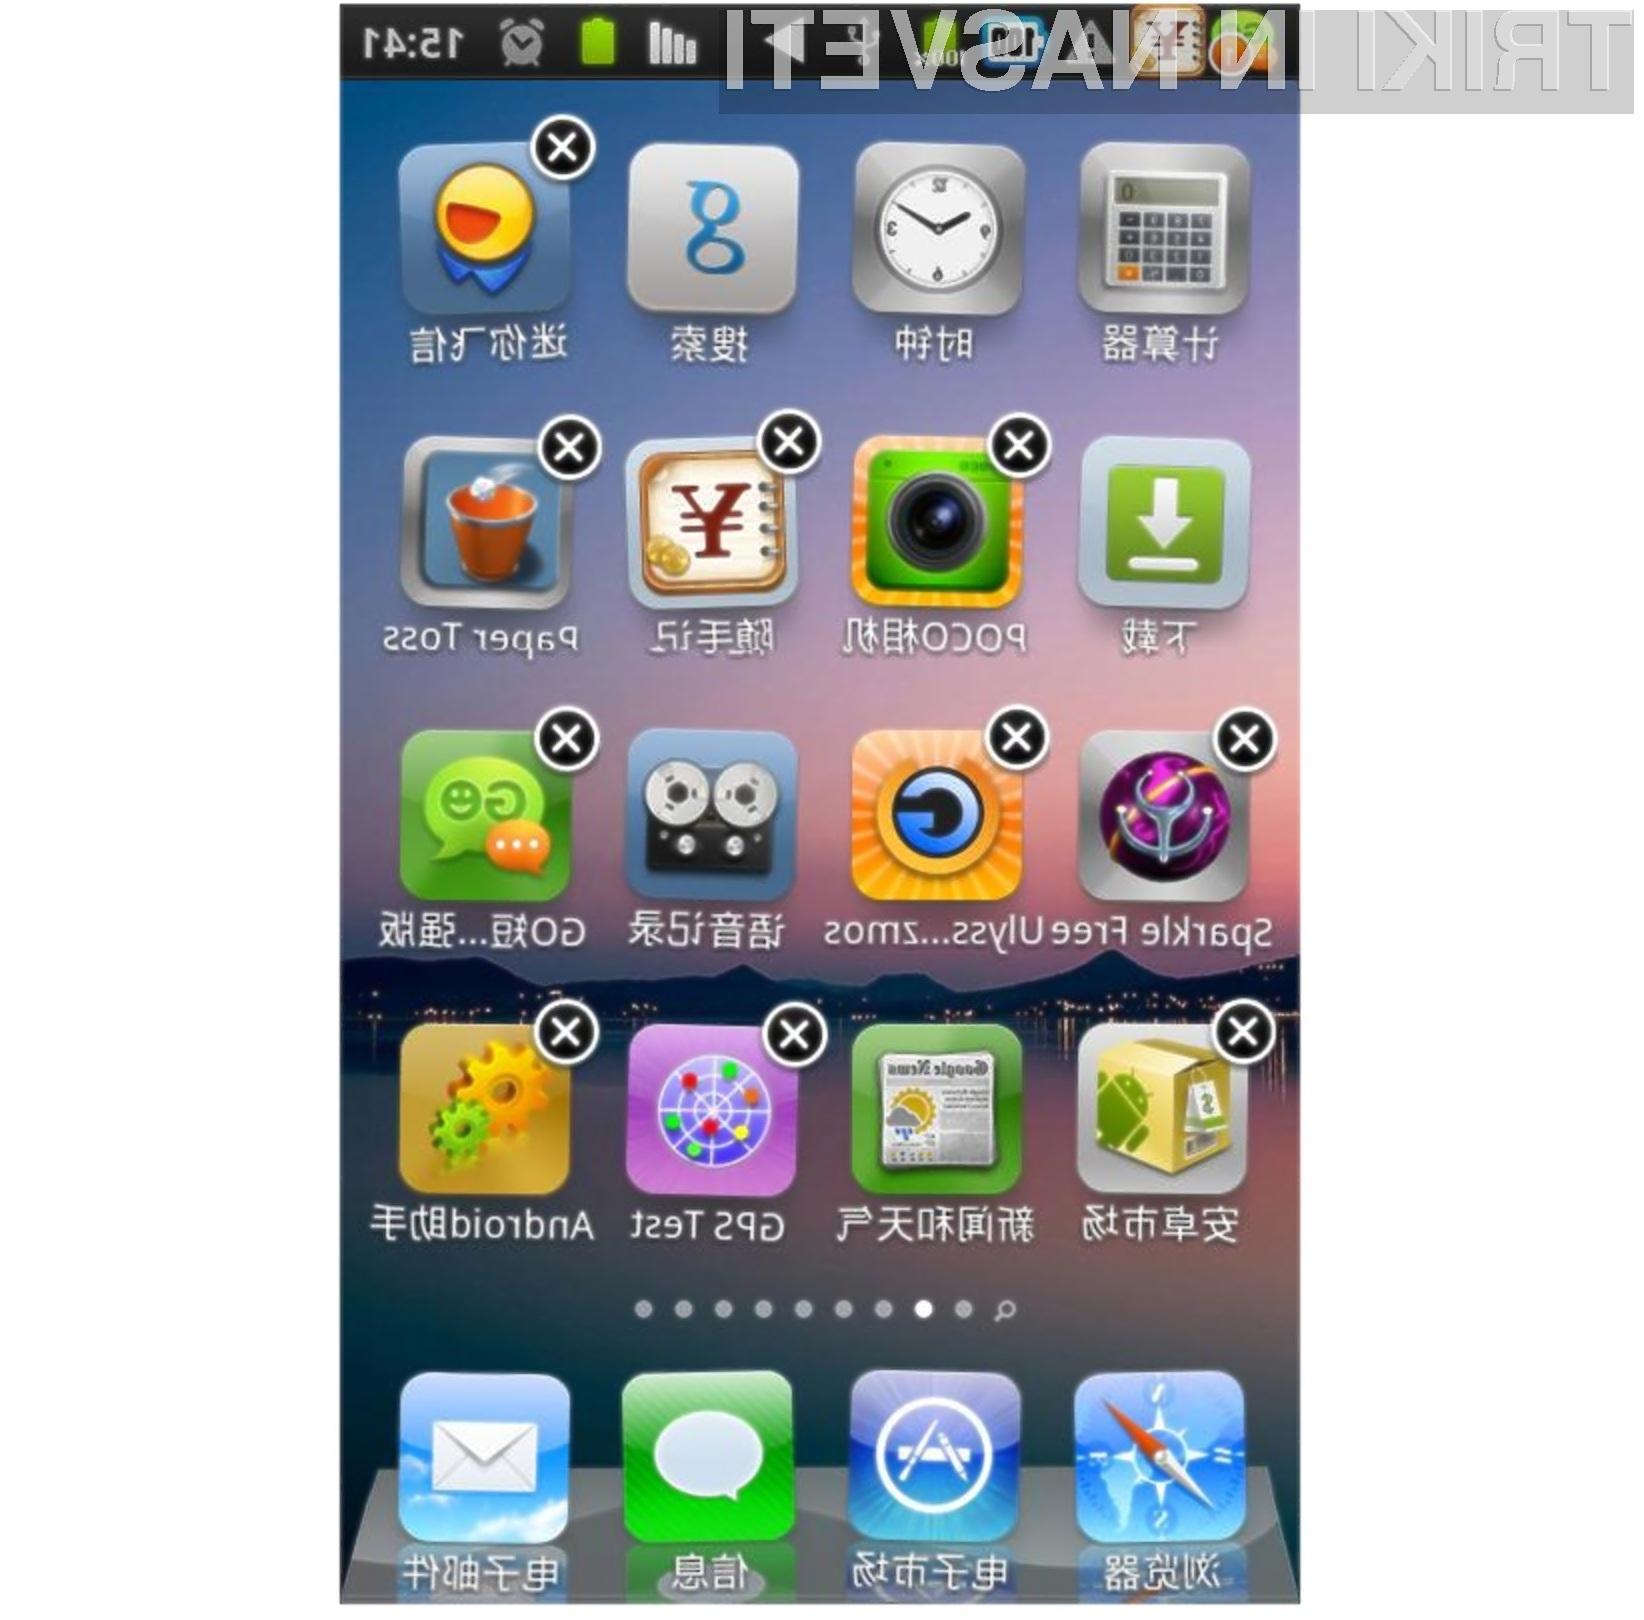 Fleksibilnost Androida in uporabnost iOSa v enem.